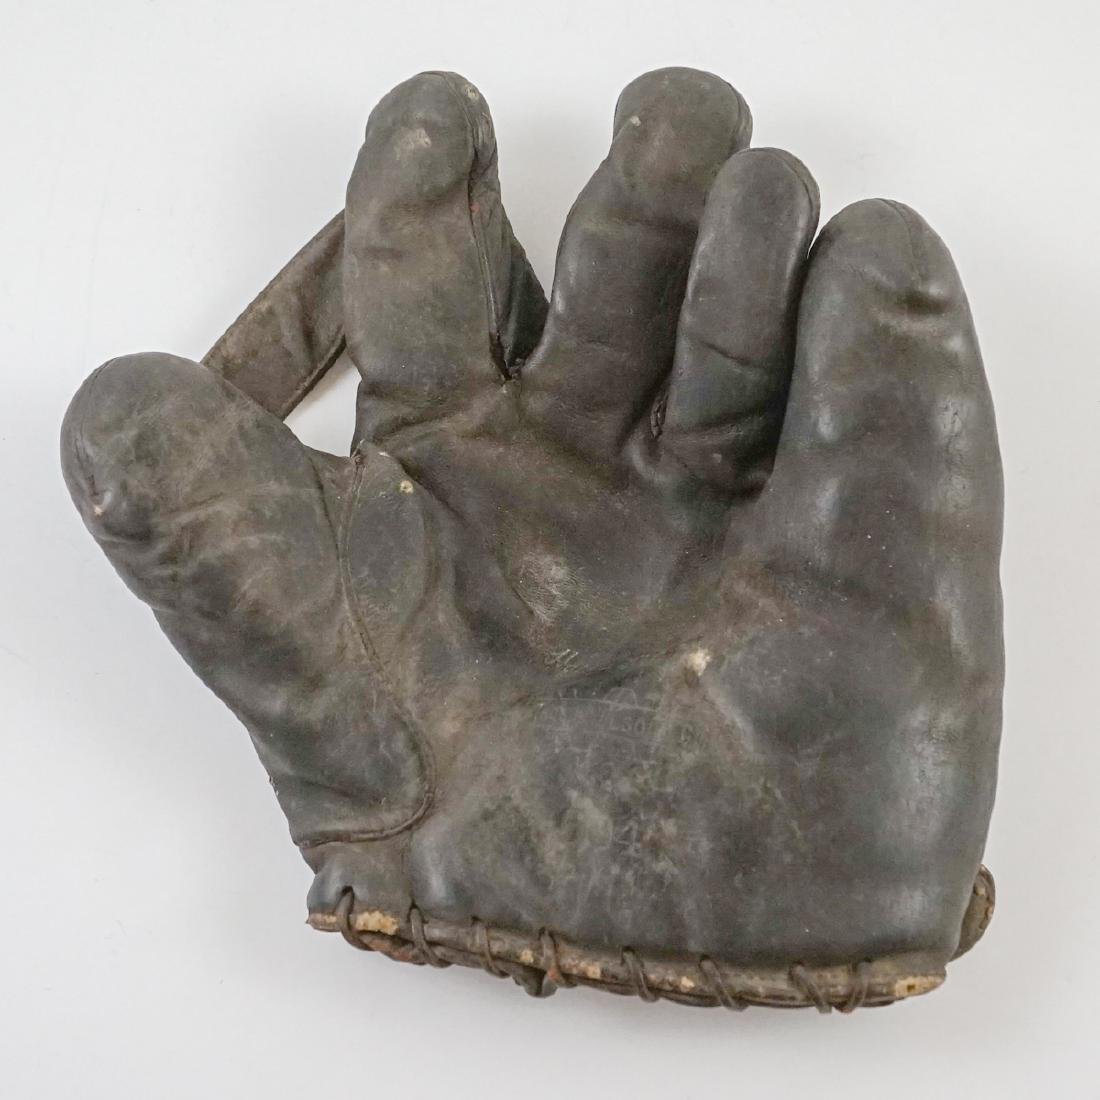 Harry Heilman Store Model Wilson Baseball Glove